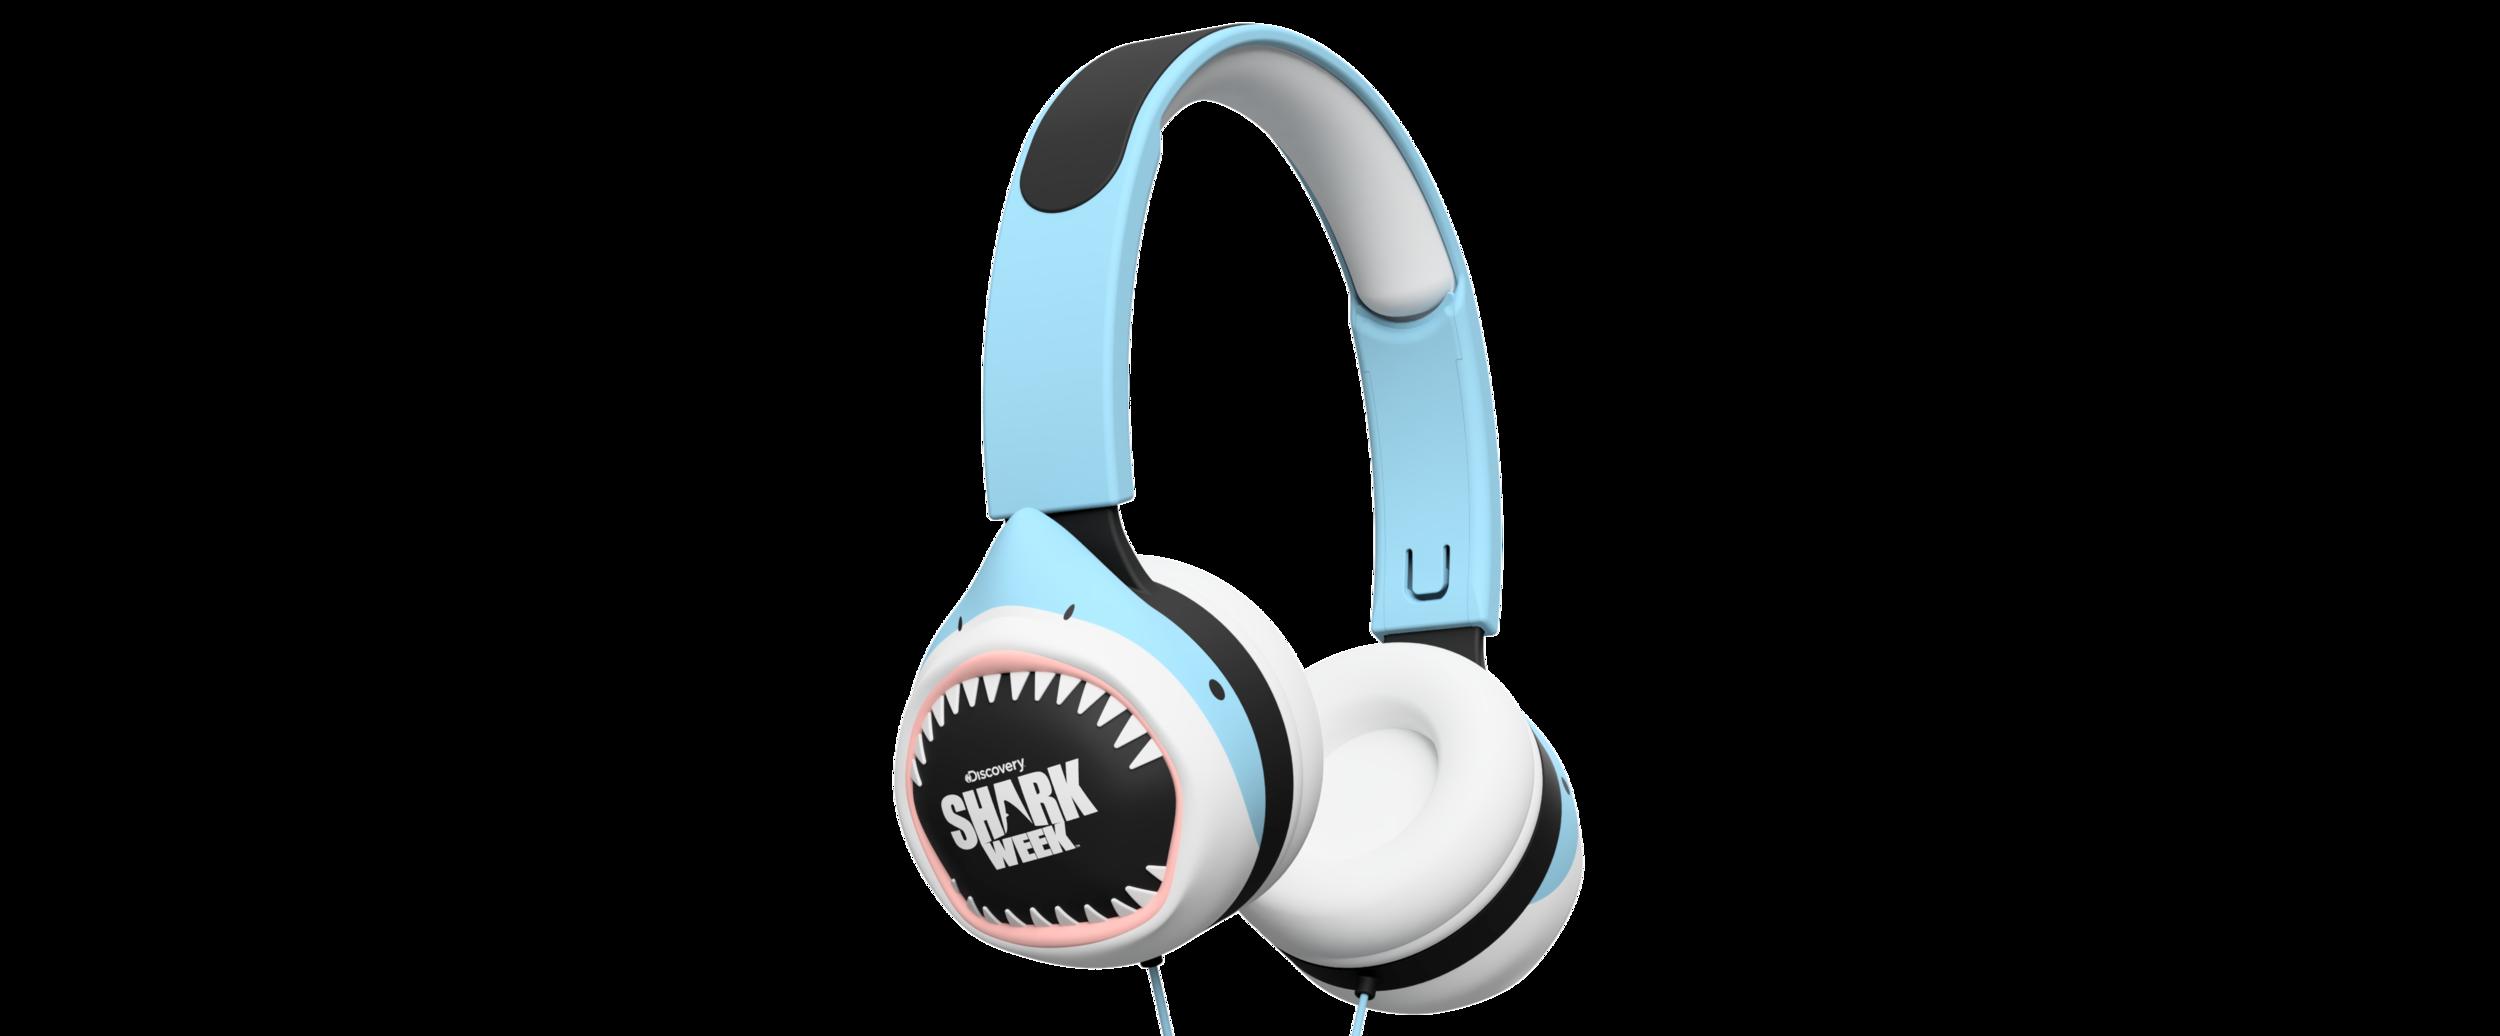 01_sharkWeek_headphones_moreRealFin_2017-Jun-20_10-19-45PM-000_CustomizedView911062205.png